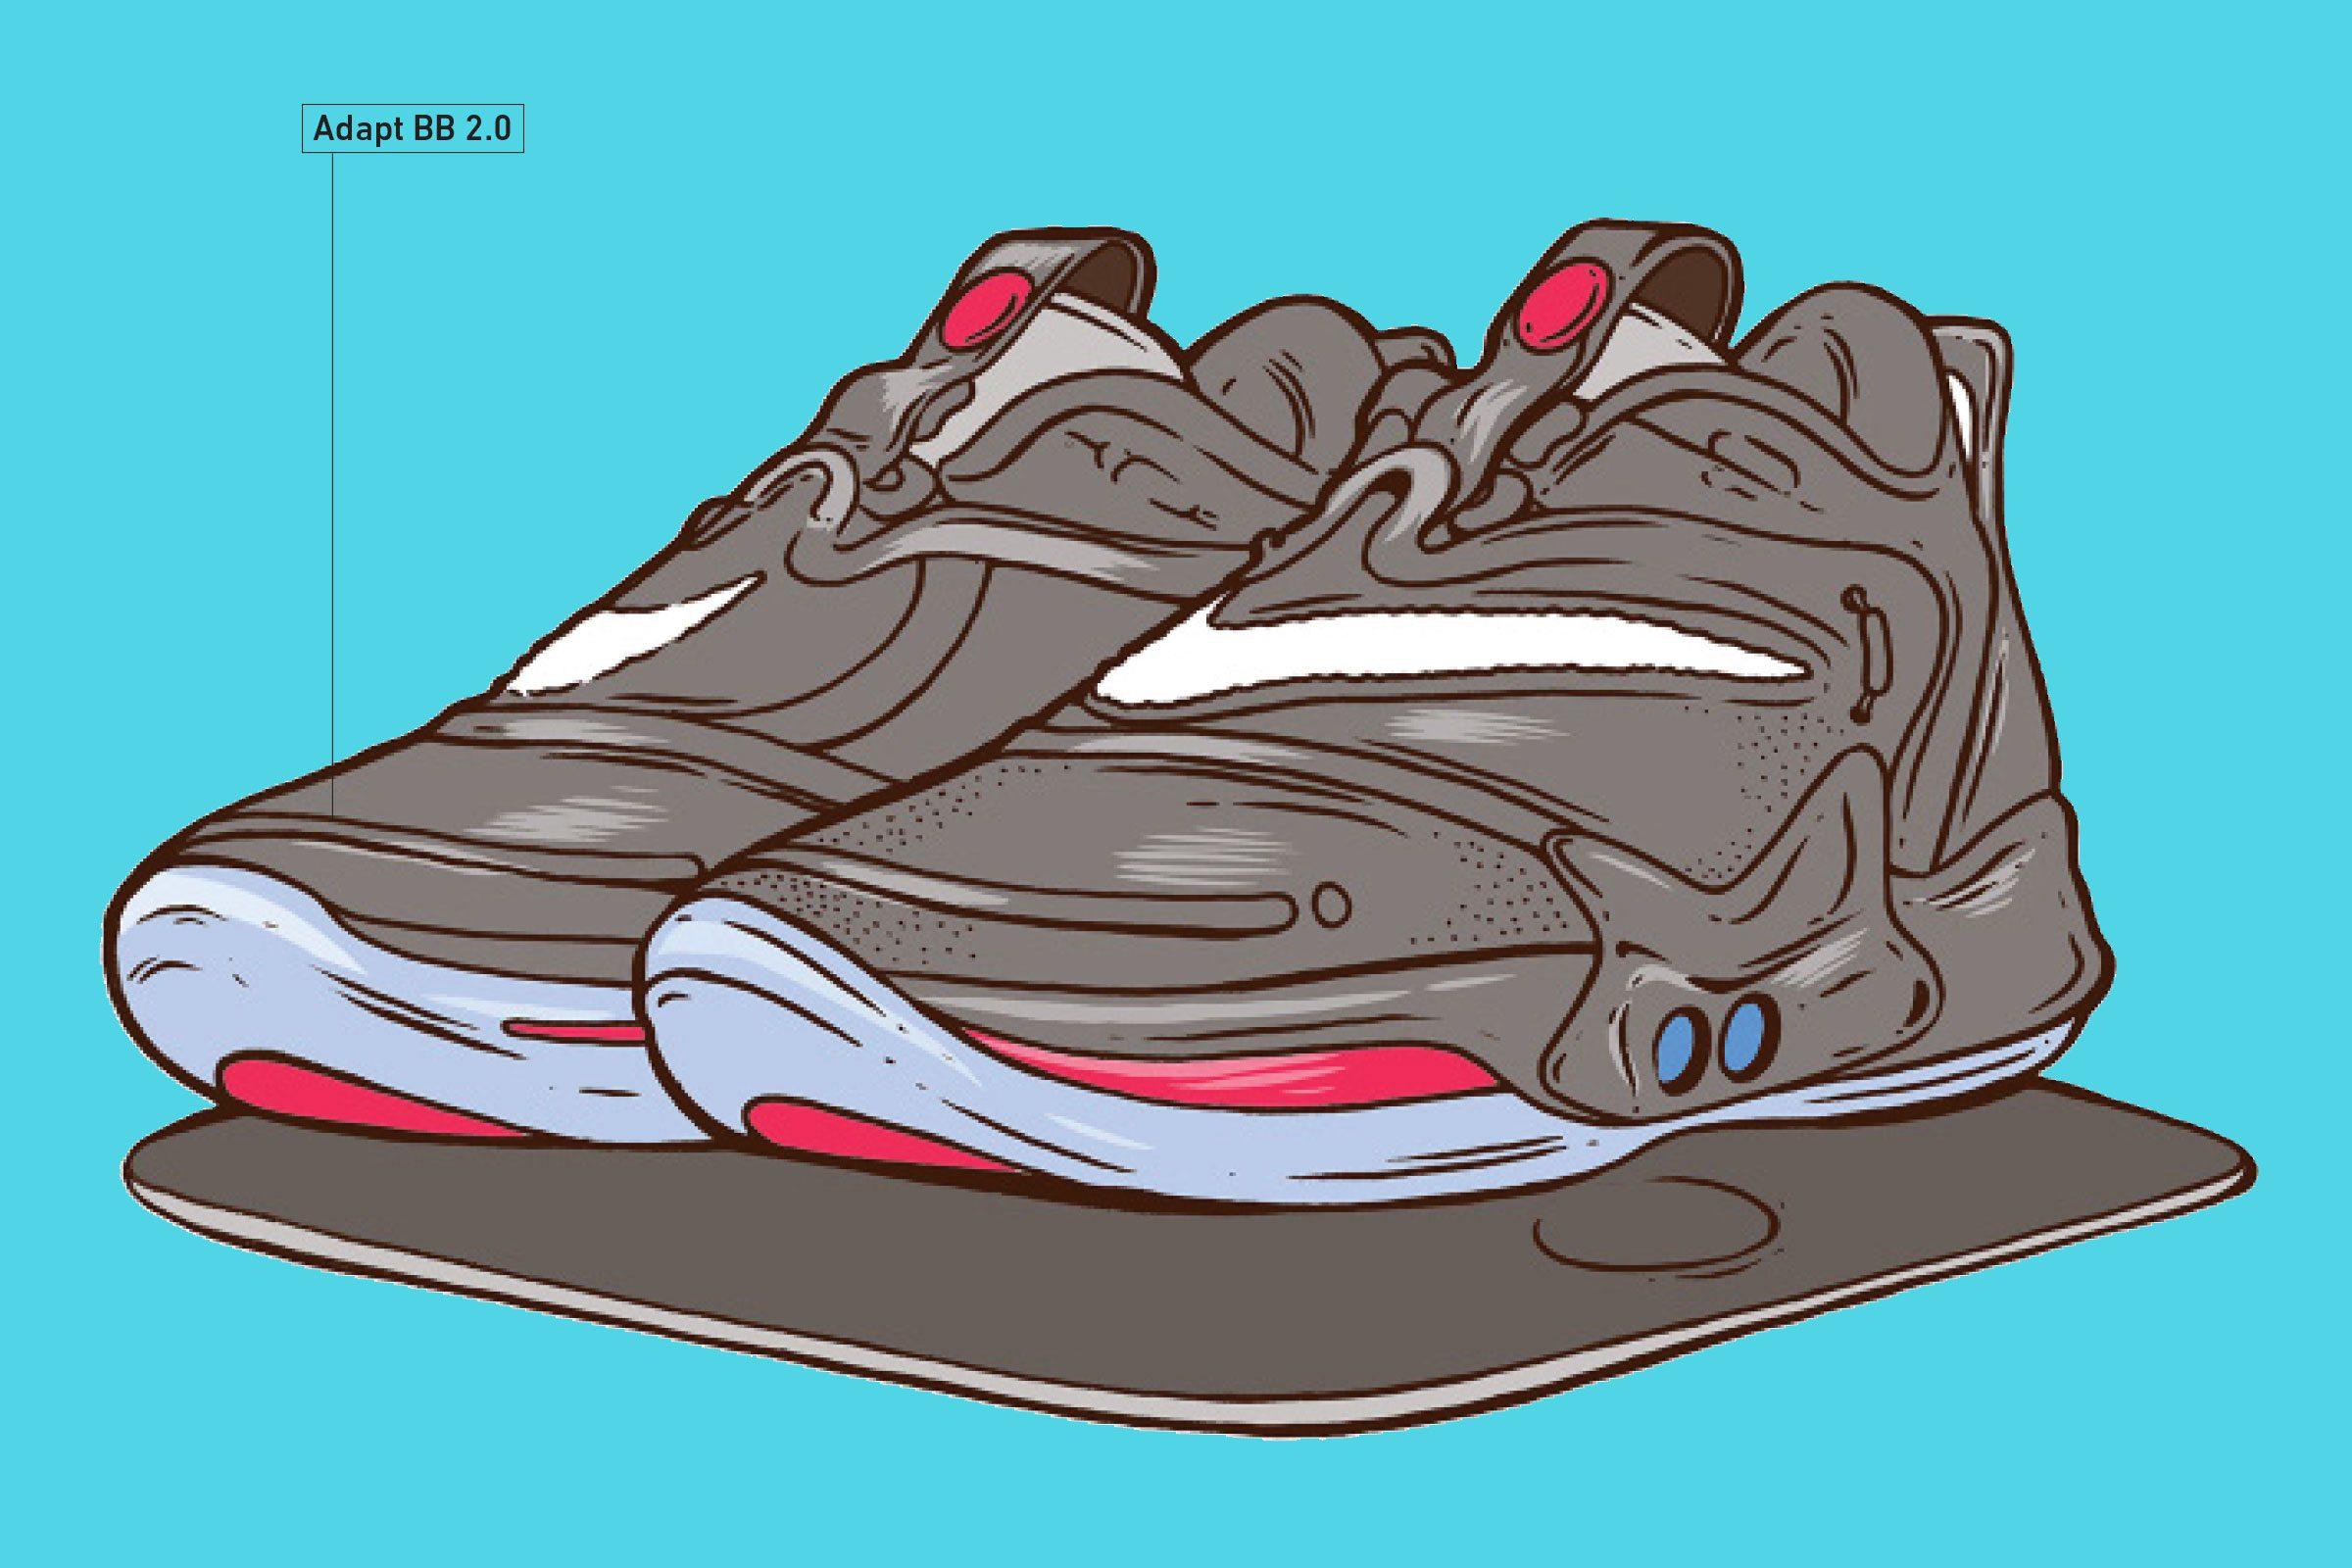 adapt bb 2.0 illustration